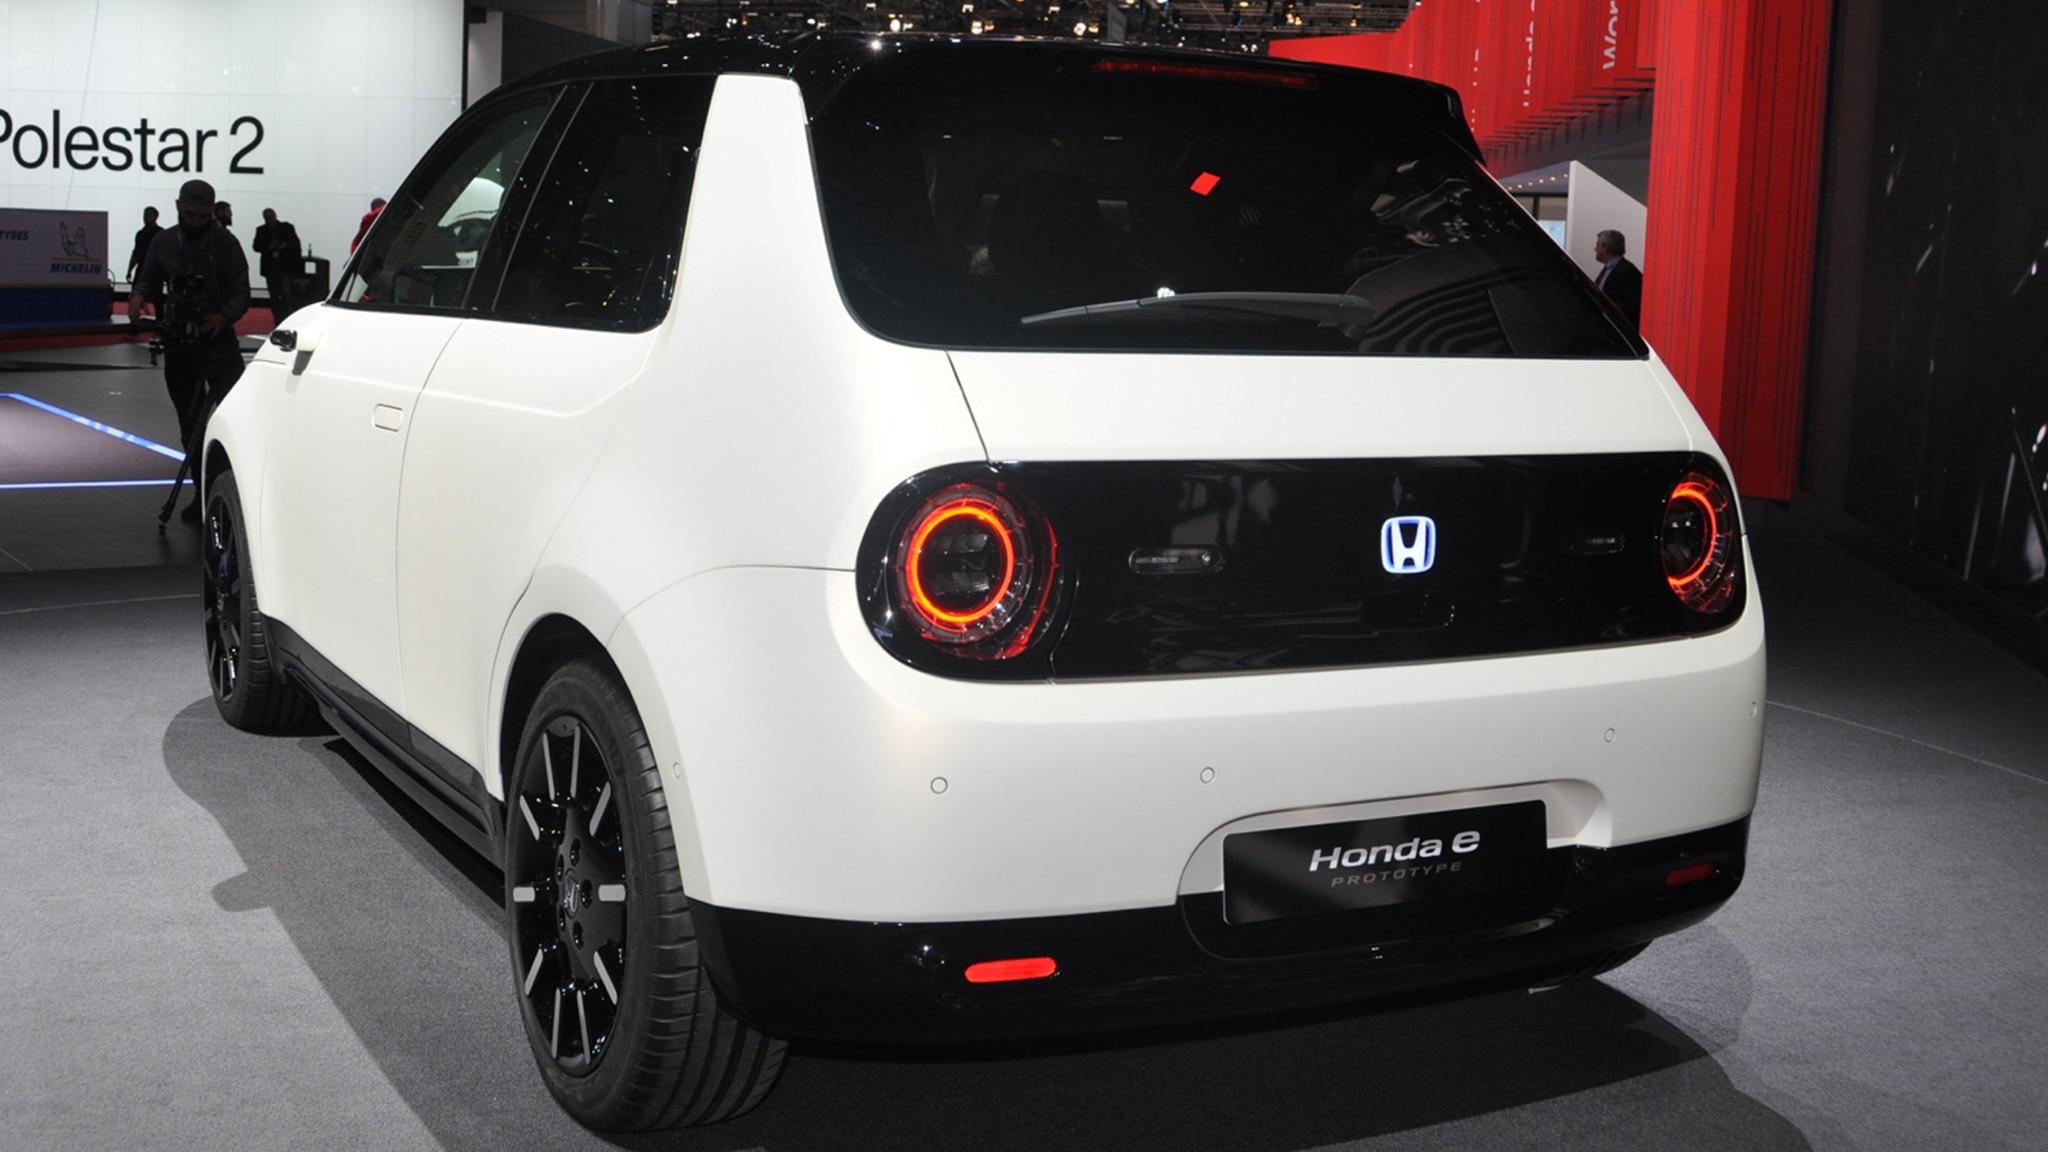 2019 Geneva Auto Show: Hits, Misses, and Revelations